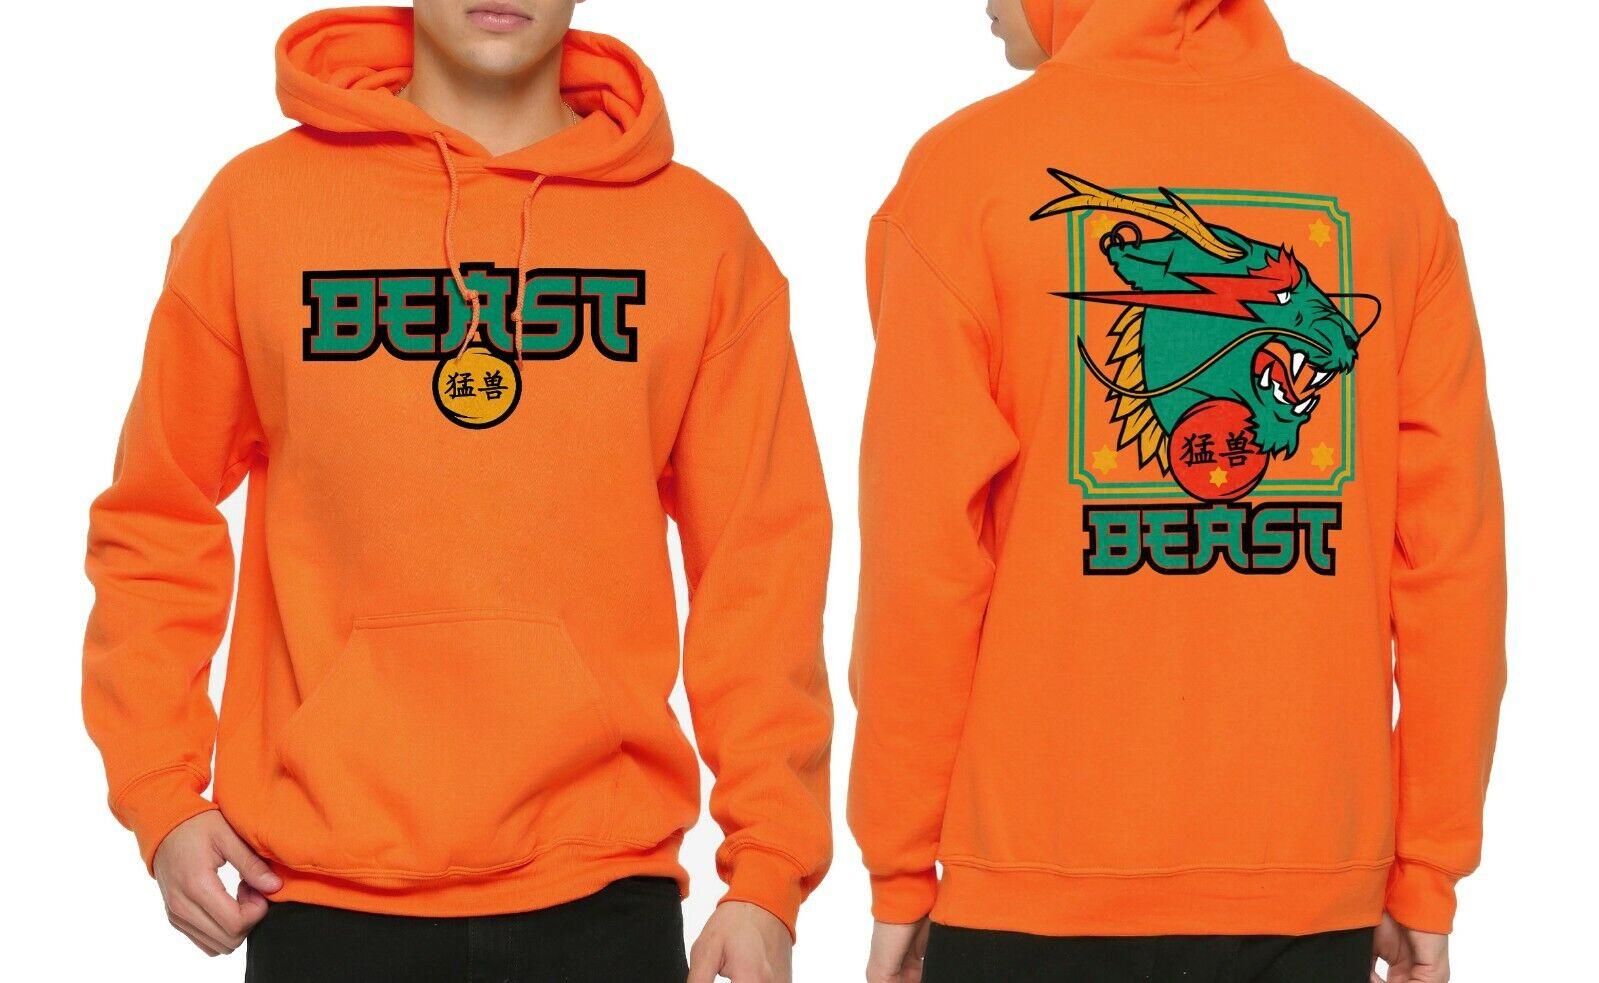 Mr Beast SUGAR RAGE T-Shirt Mr Beast Shirt Mr Beast Merch Adult Mountain Dew Tee